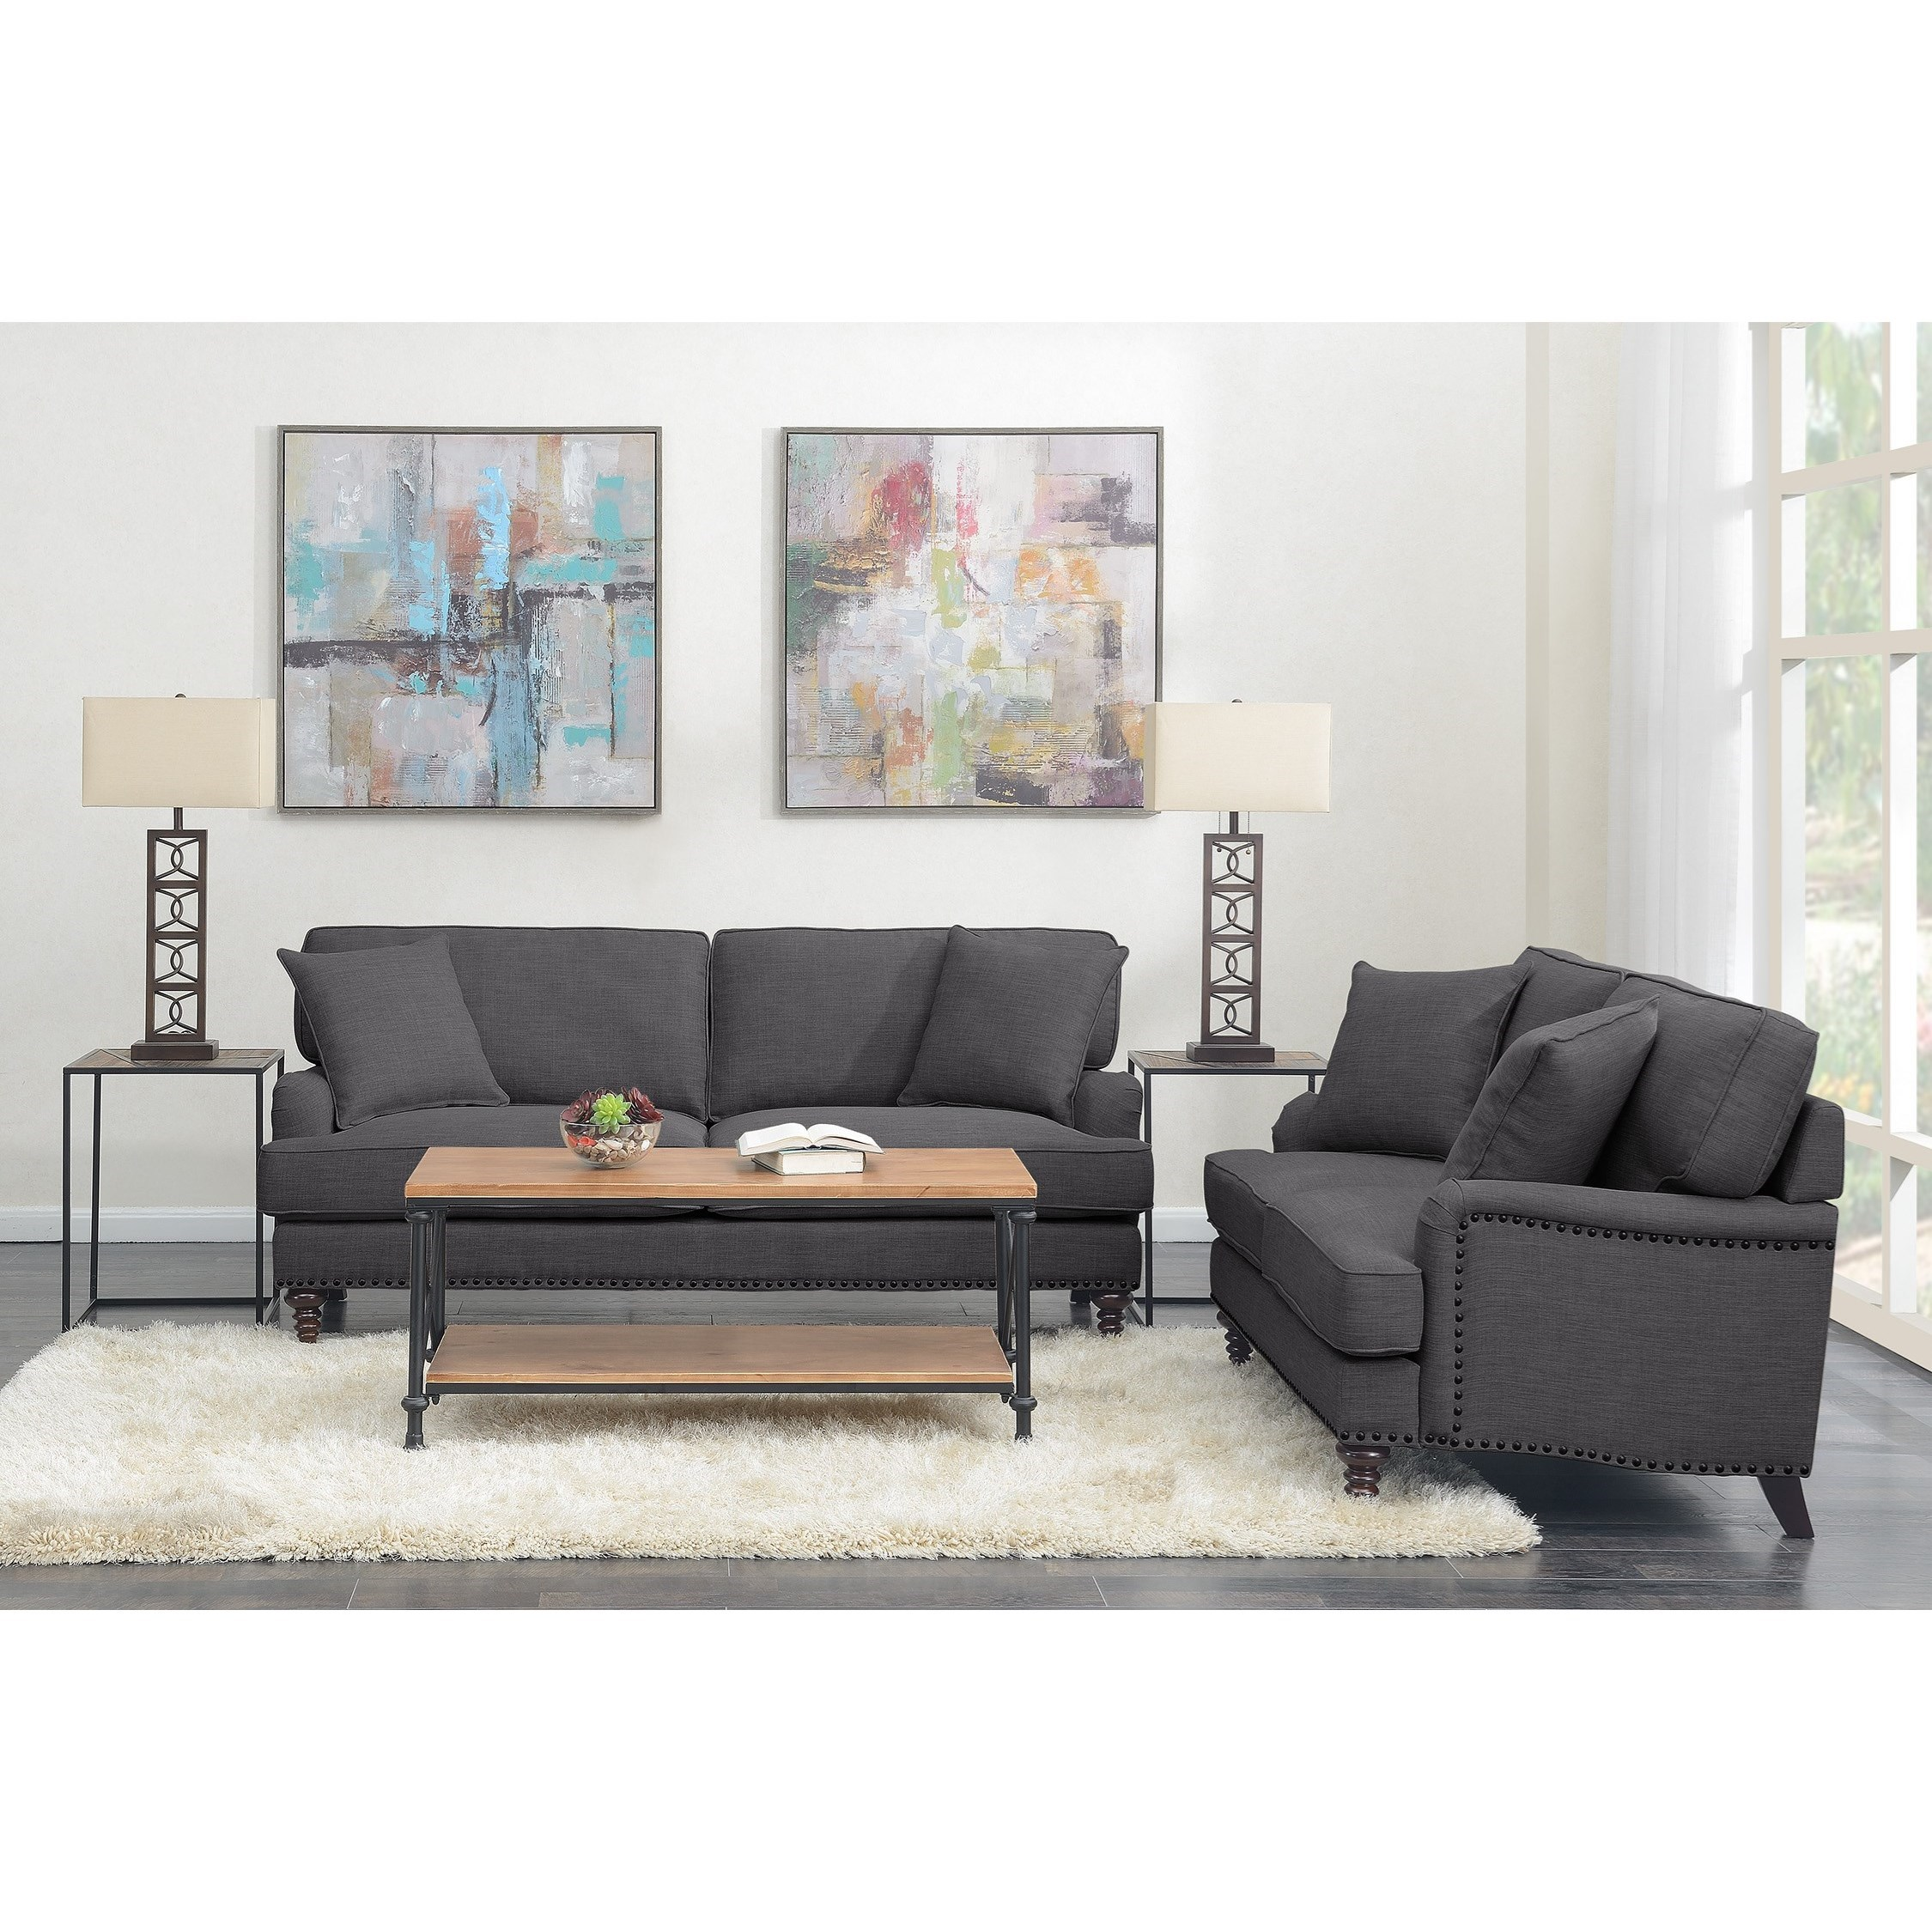 Abby 2PC Set-Sofa & Loveseat by Elements International at Lynn's Furniture & Mattress